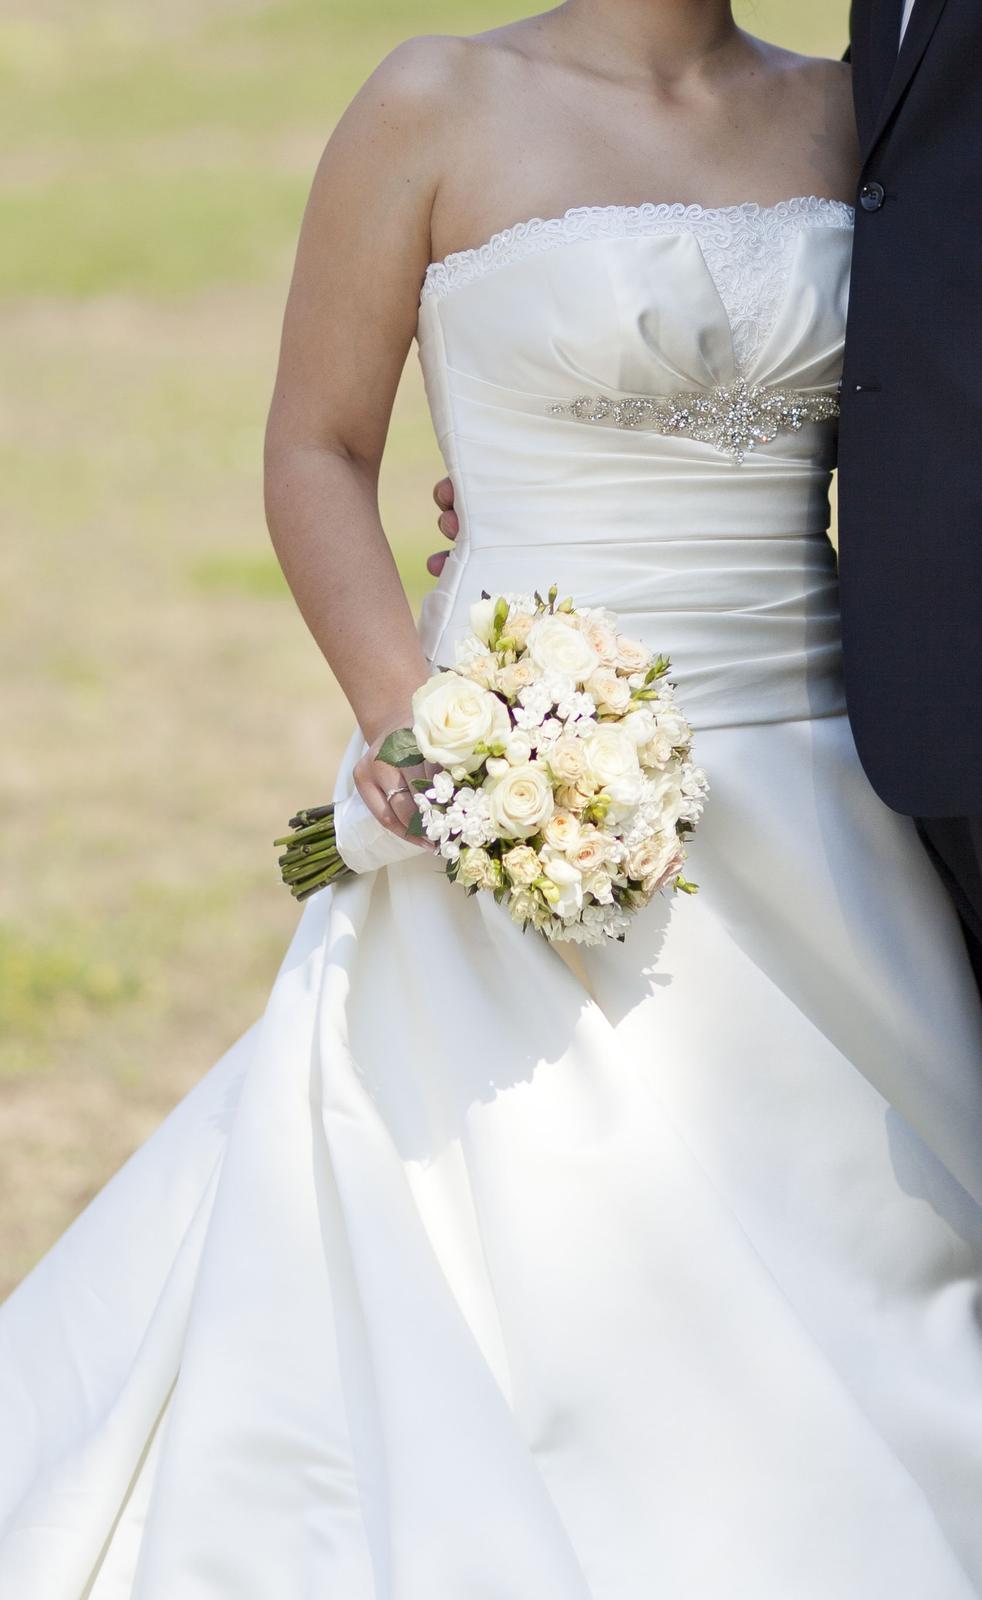 Svadobné šaty La Sposa - Obrázok č. 1